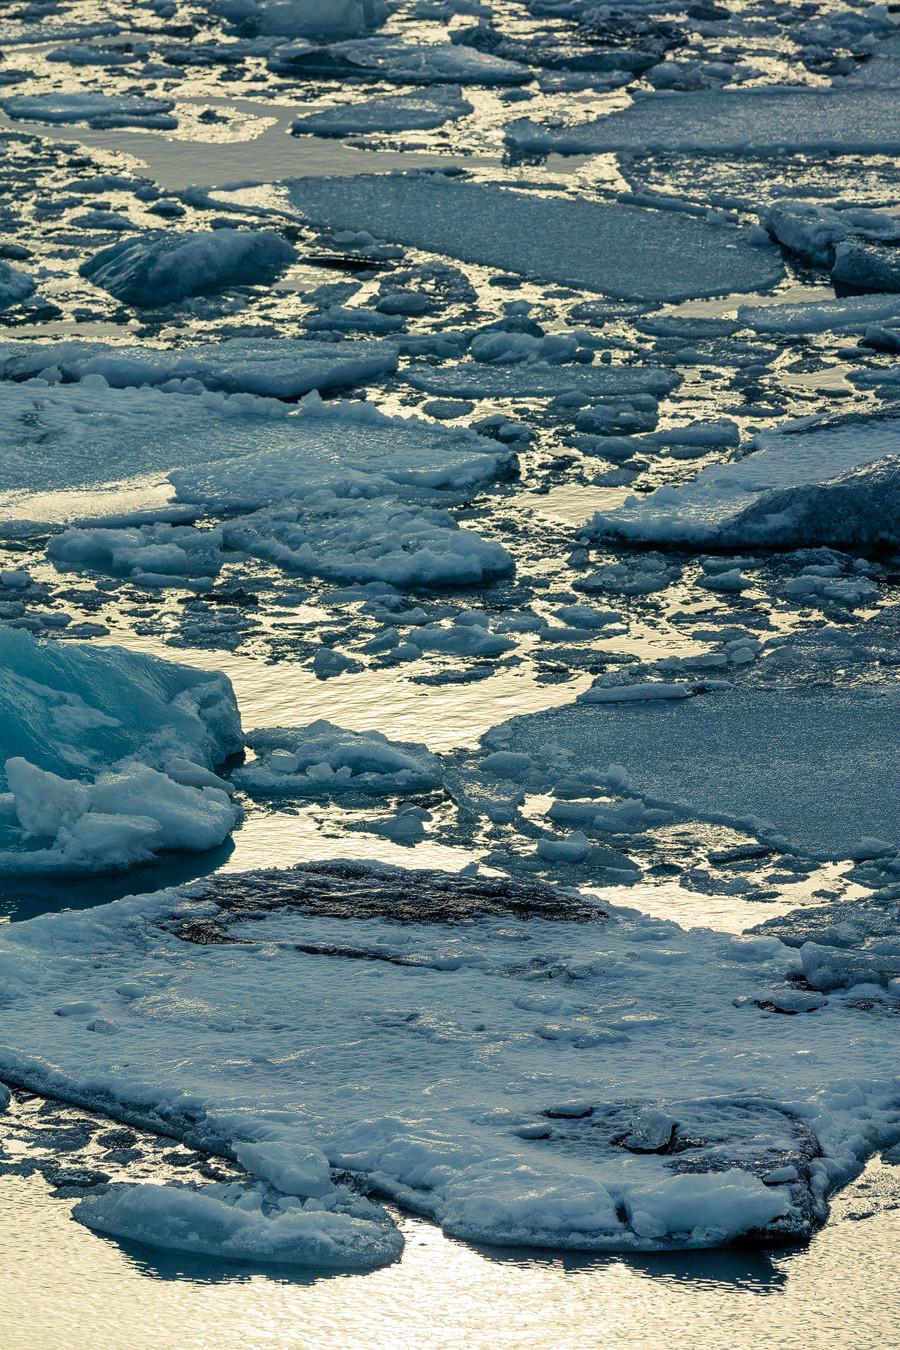 Eisschollen, kurz vor dem Raustreiben aufs offene Meer.